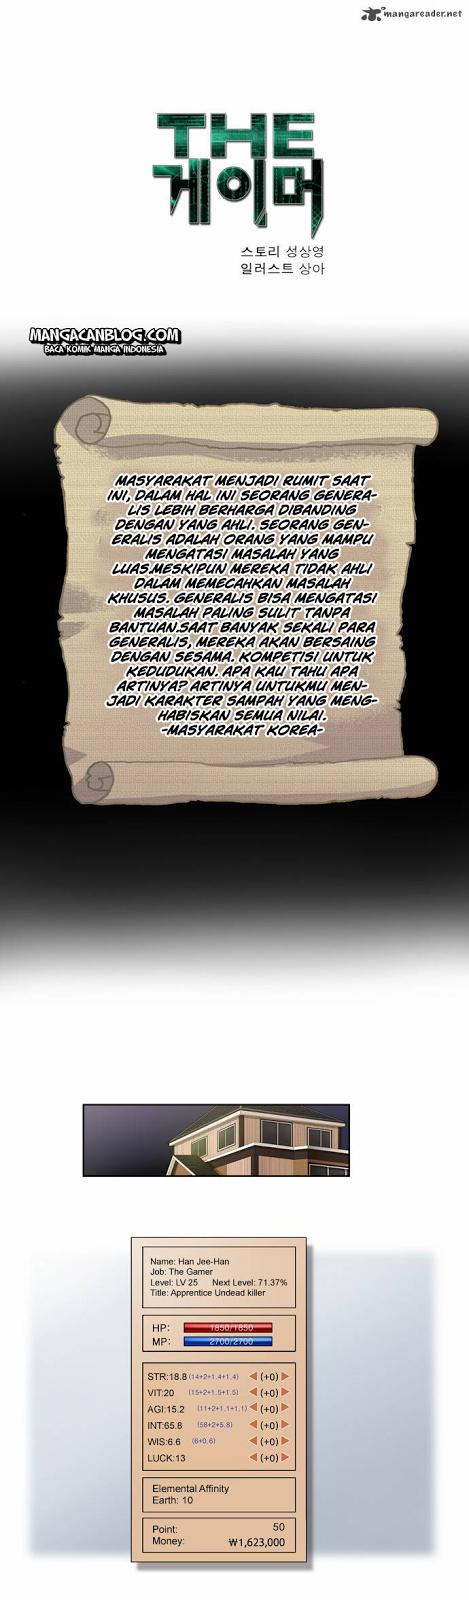 Dilarang COPAS - situs resmi www.mangacanblog.com - Komik the gamer 041 - chapter 41 42 Indonesia the gamer 041 - chapter 41 Terbaru |Baca Manga Komik Indonesia|Mangacan